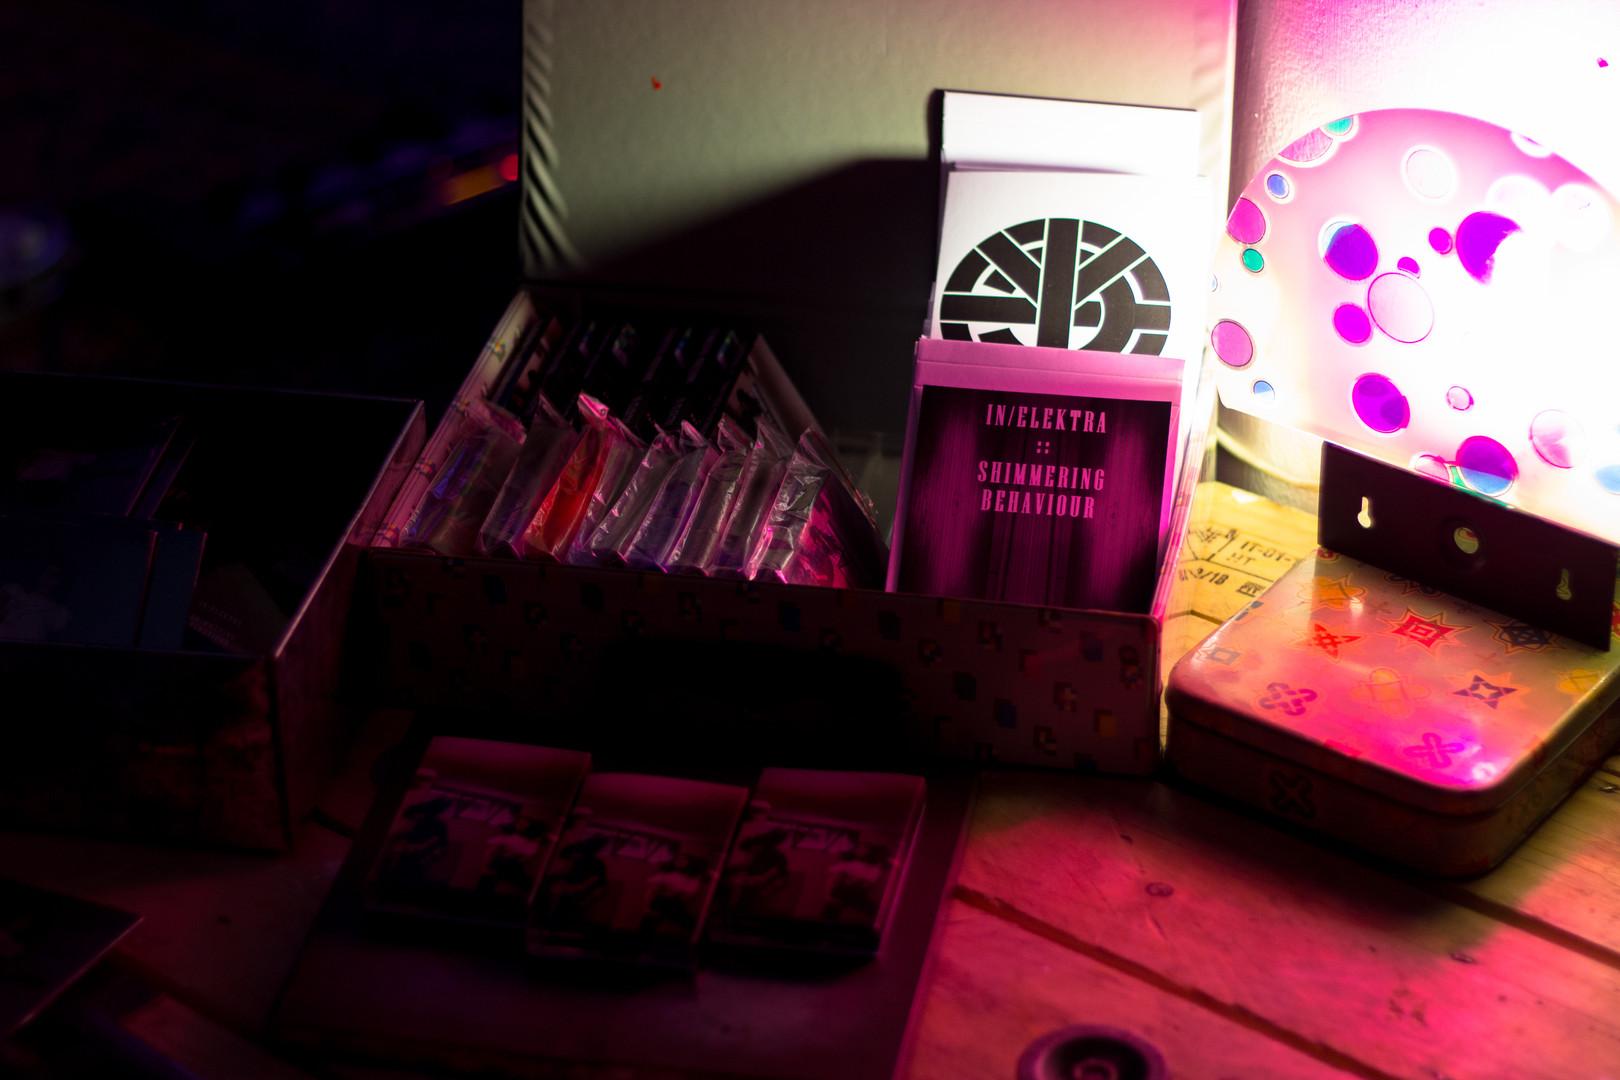 IN/ELEKTRA Tape + postcard